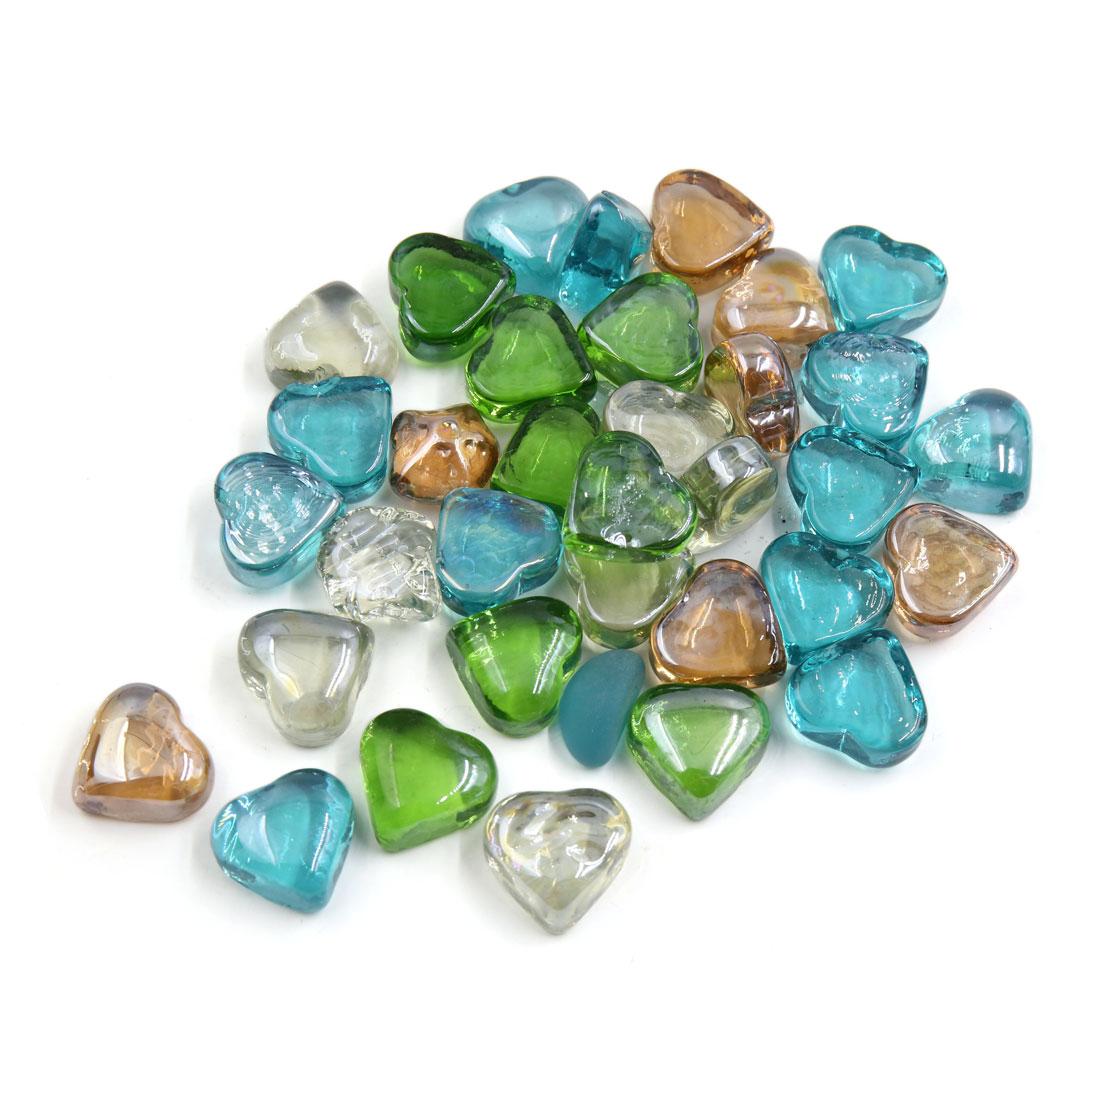 500g Multicolor Glass Heart Shaped Fish Tank Aquarium Decor Pebble Bead Stones